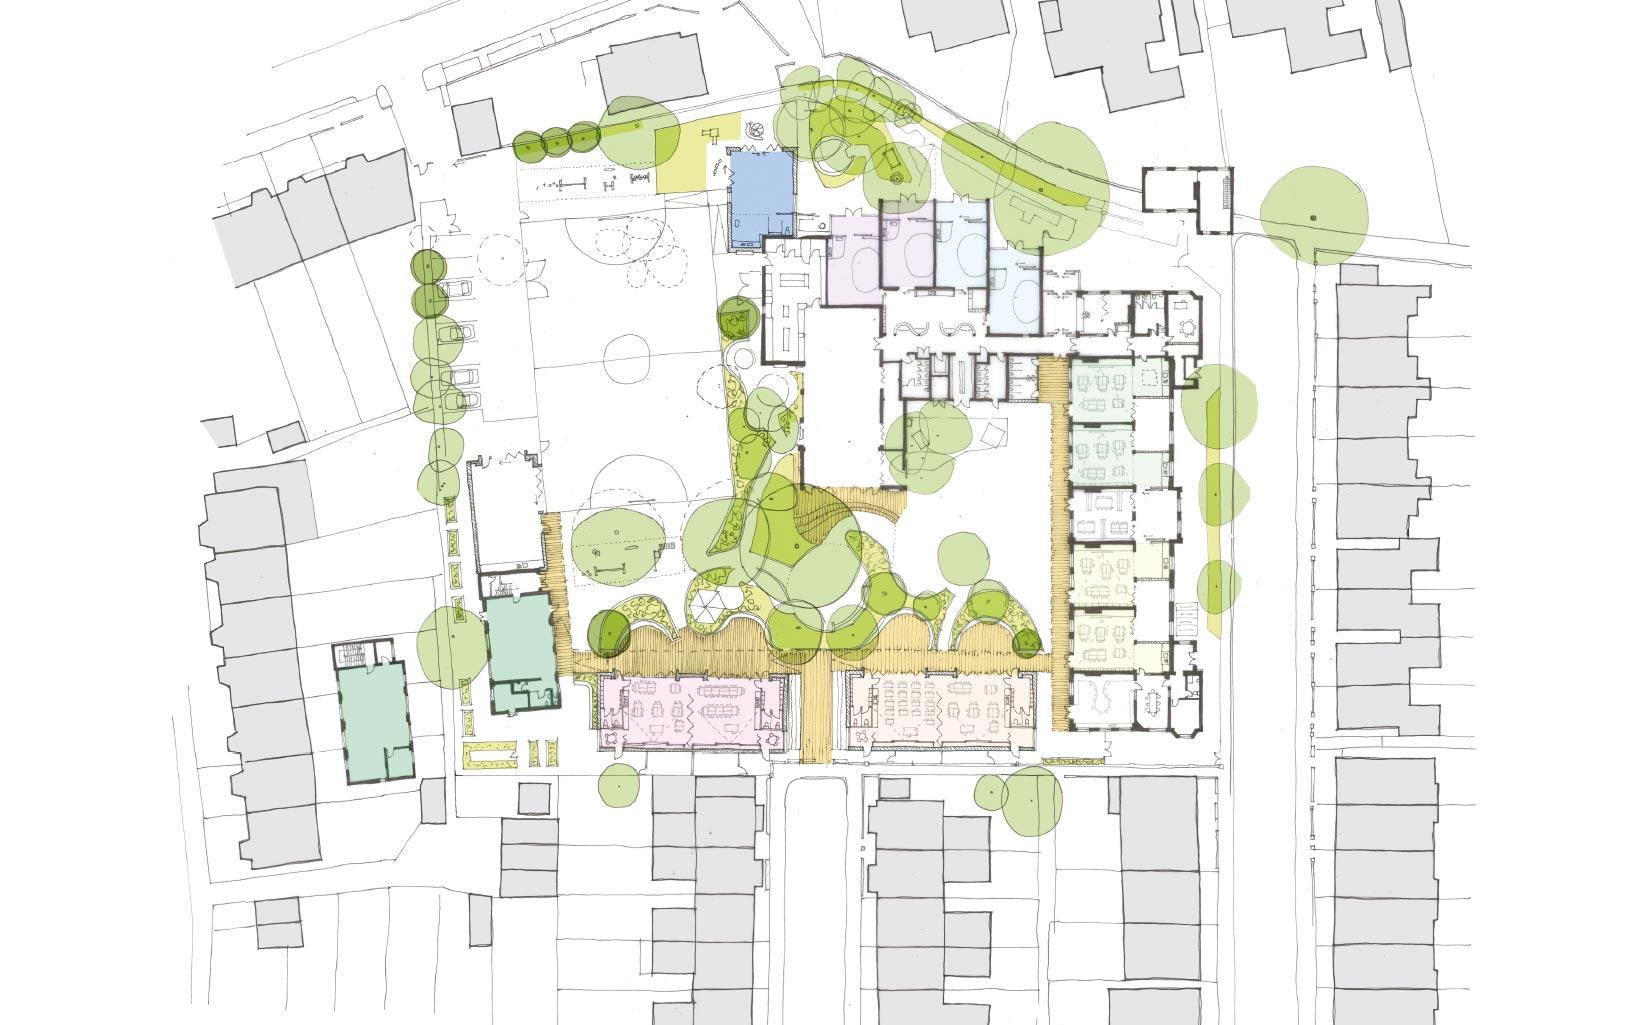 Orleans School, Twickenham, London, Plan